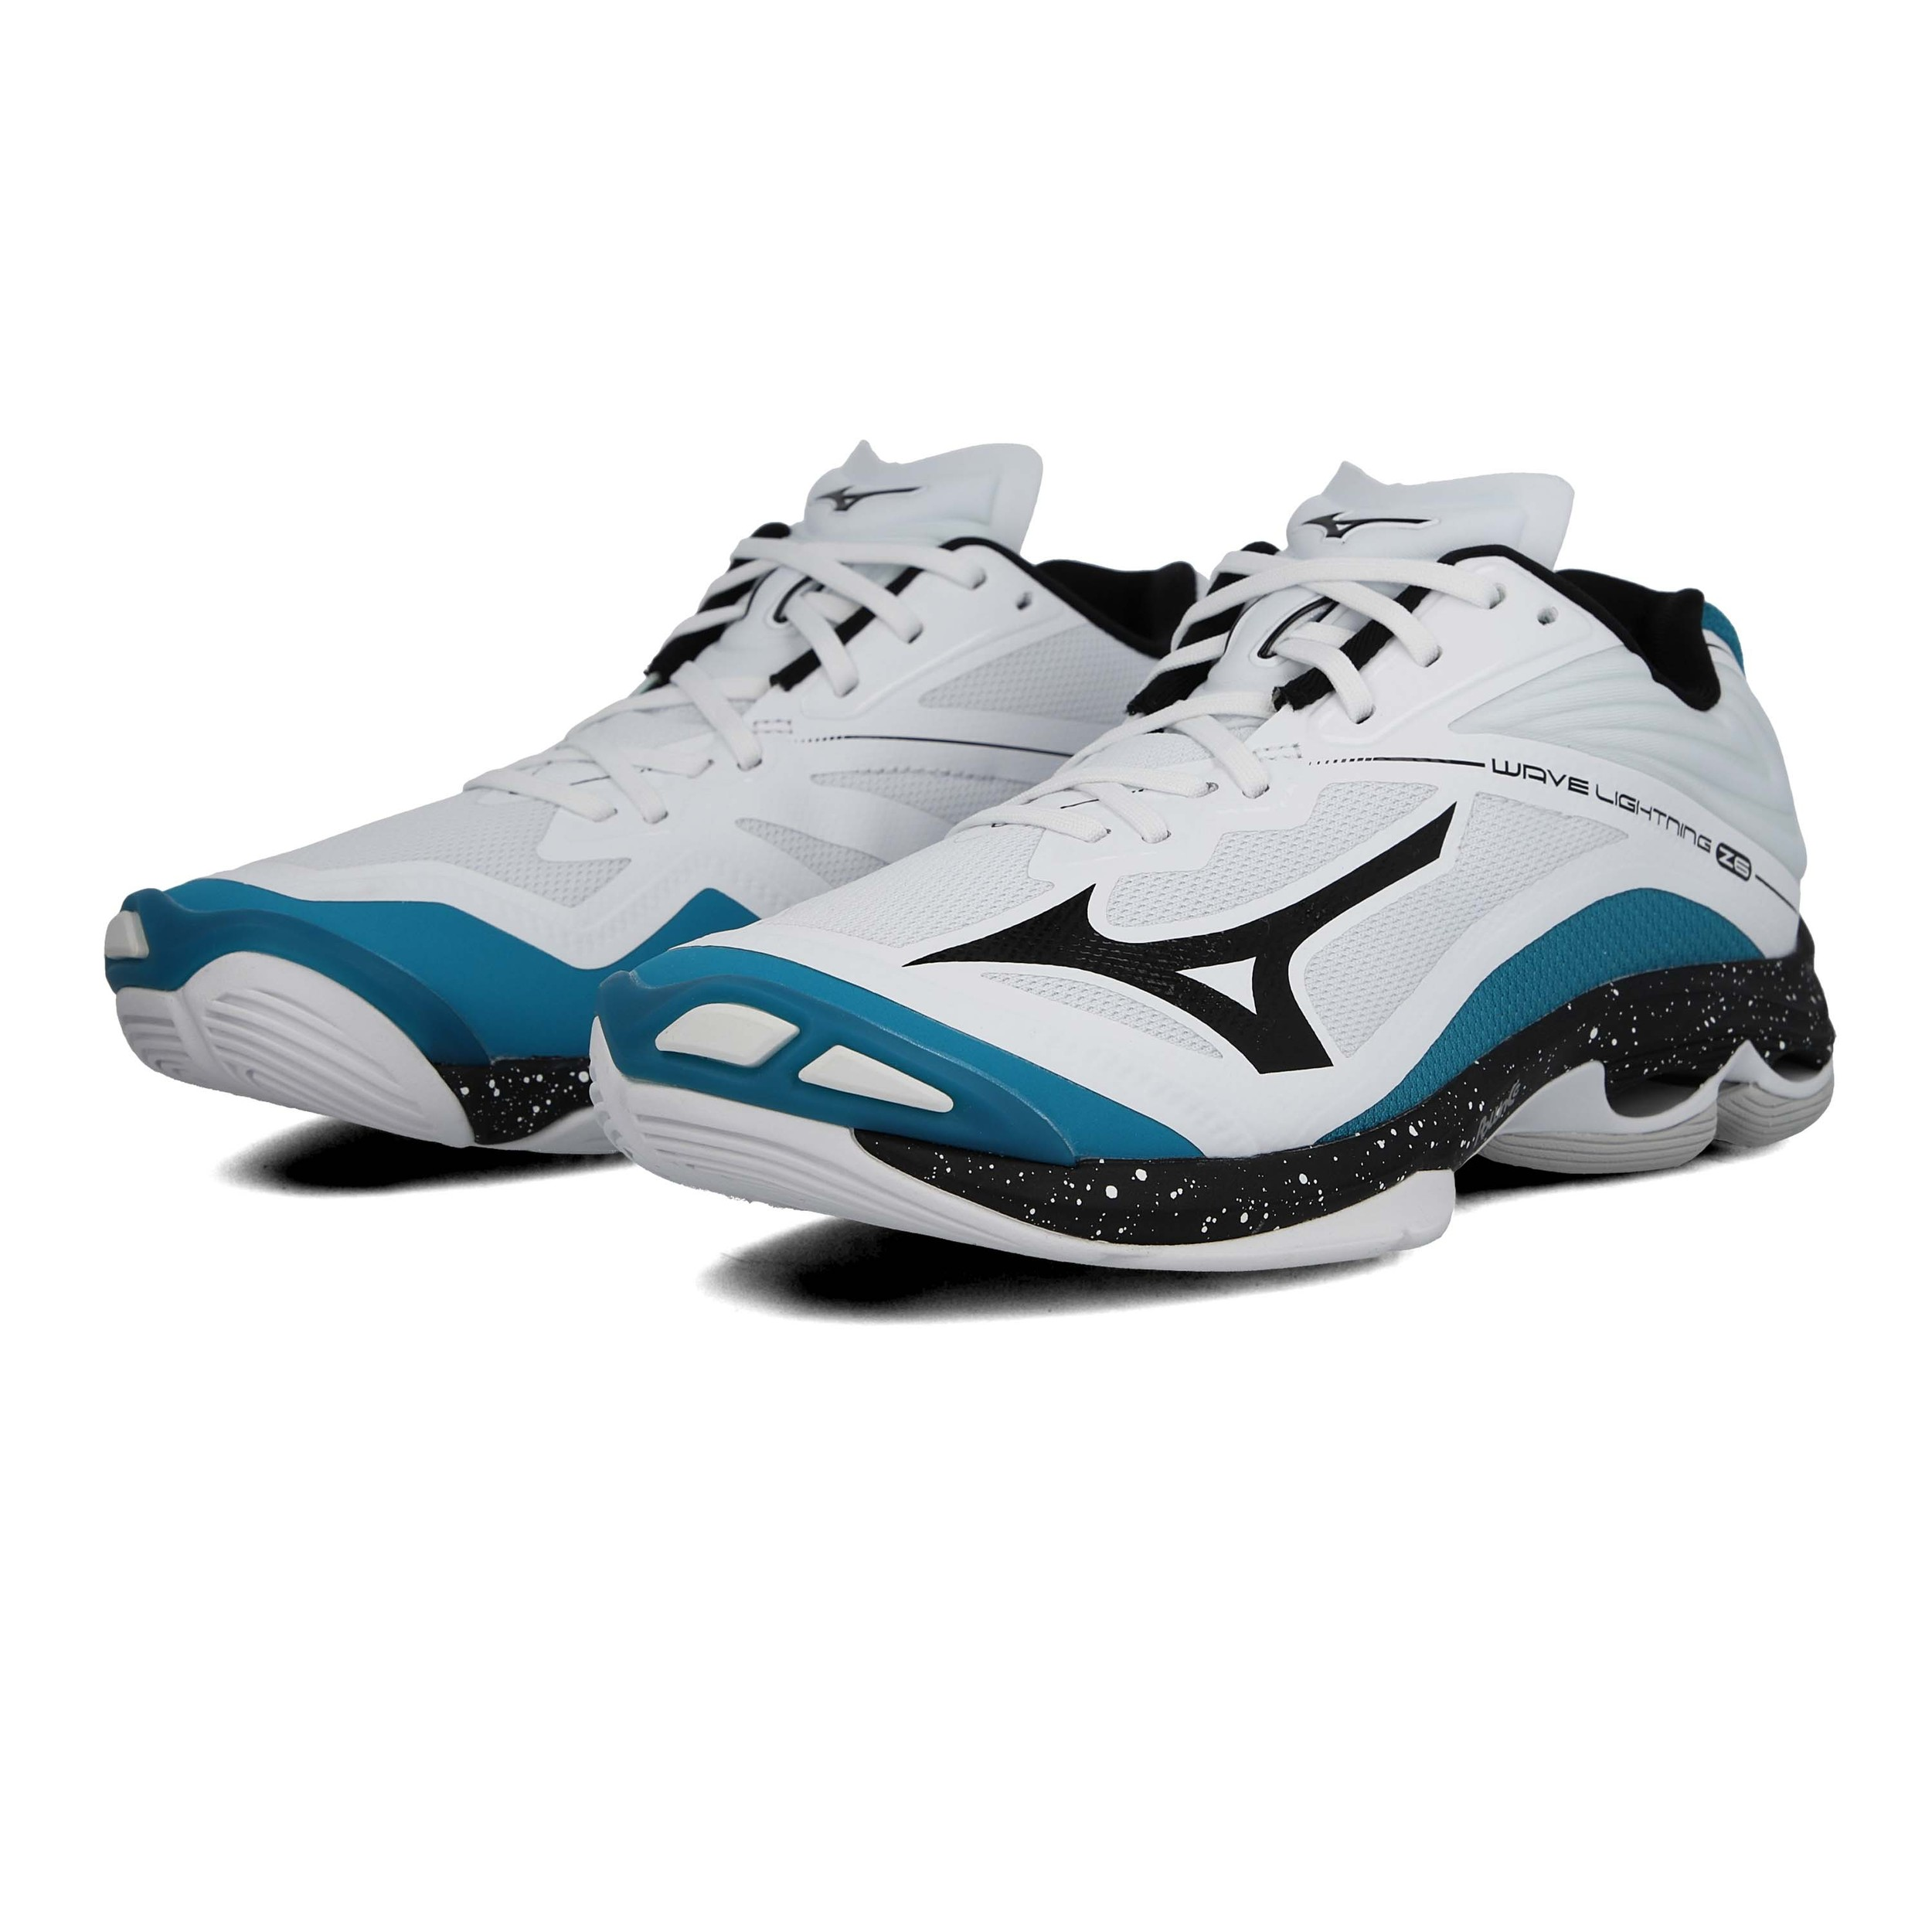 mizuno running shoes size 15 herren 46 94